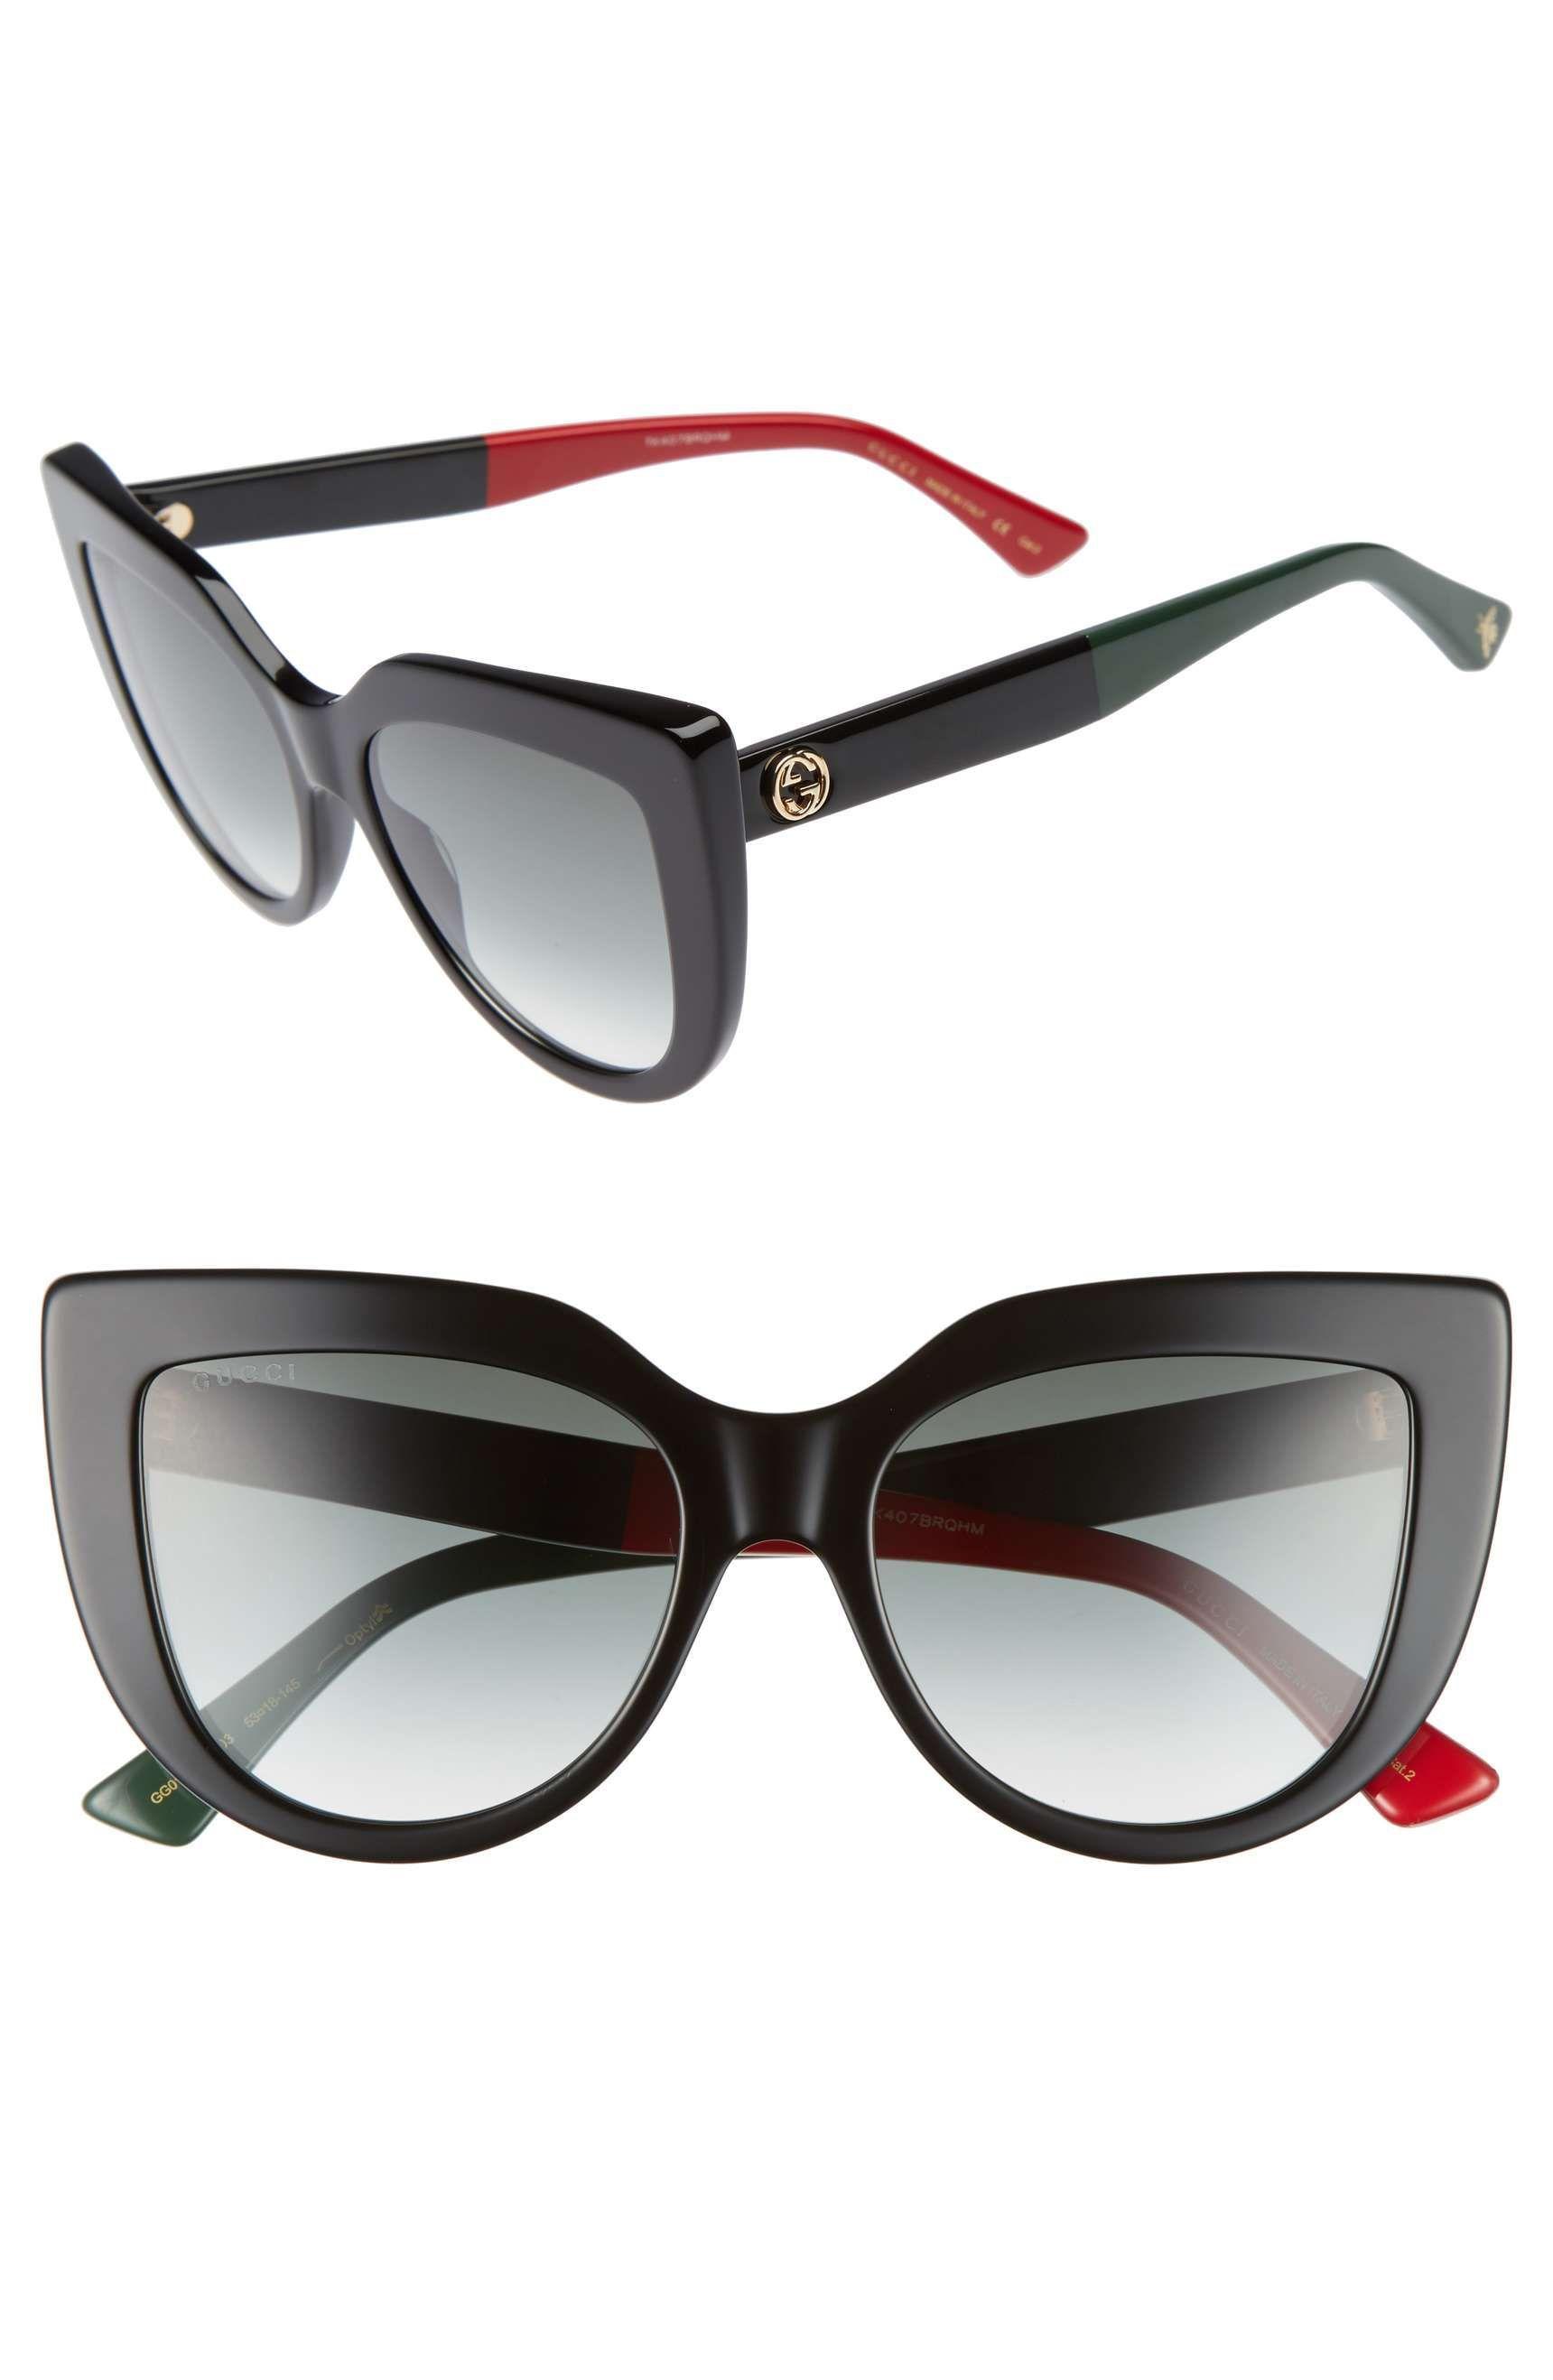 a20f4e62ce Main Image - Gucci 53mm Cat Eye Sunglasses